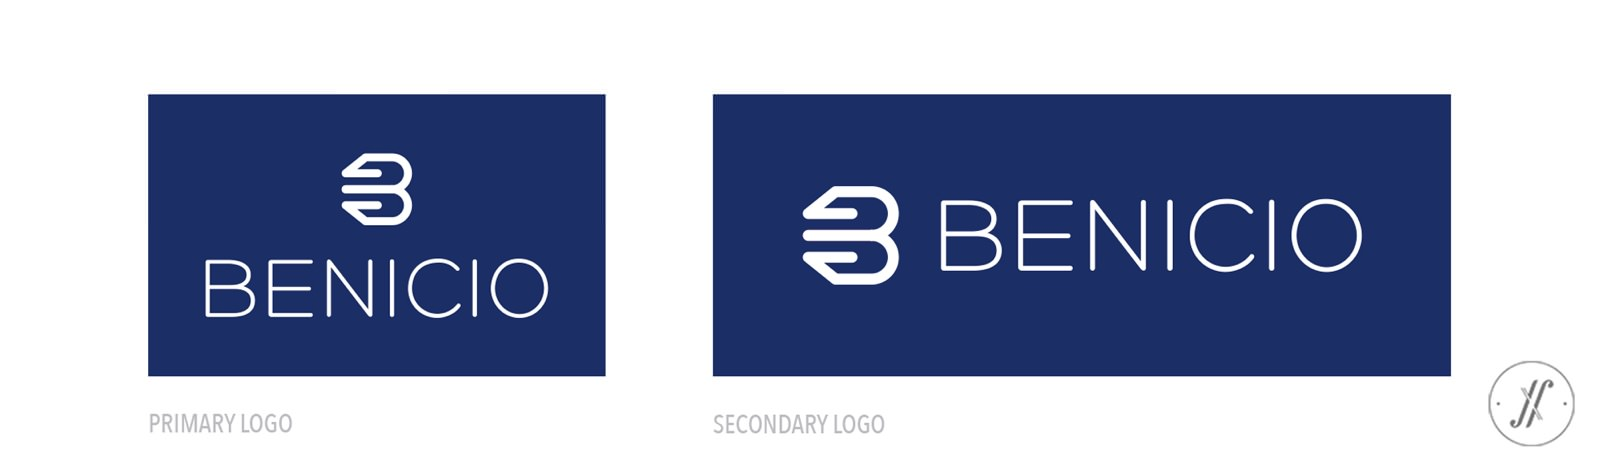 Yellow Fishes YF Branding Agency Mumbai India Menswear Brand Apparel Branding Agency Benicio Brand Logo Design Primary Logo & Secondary Logo Design